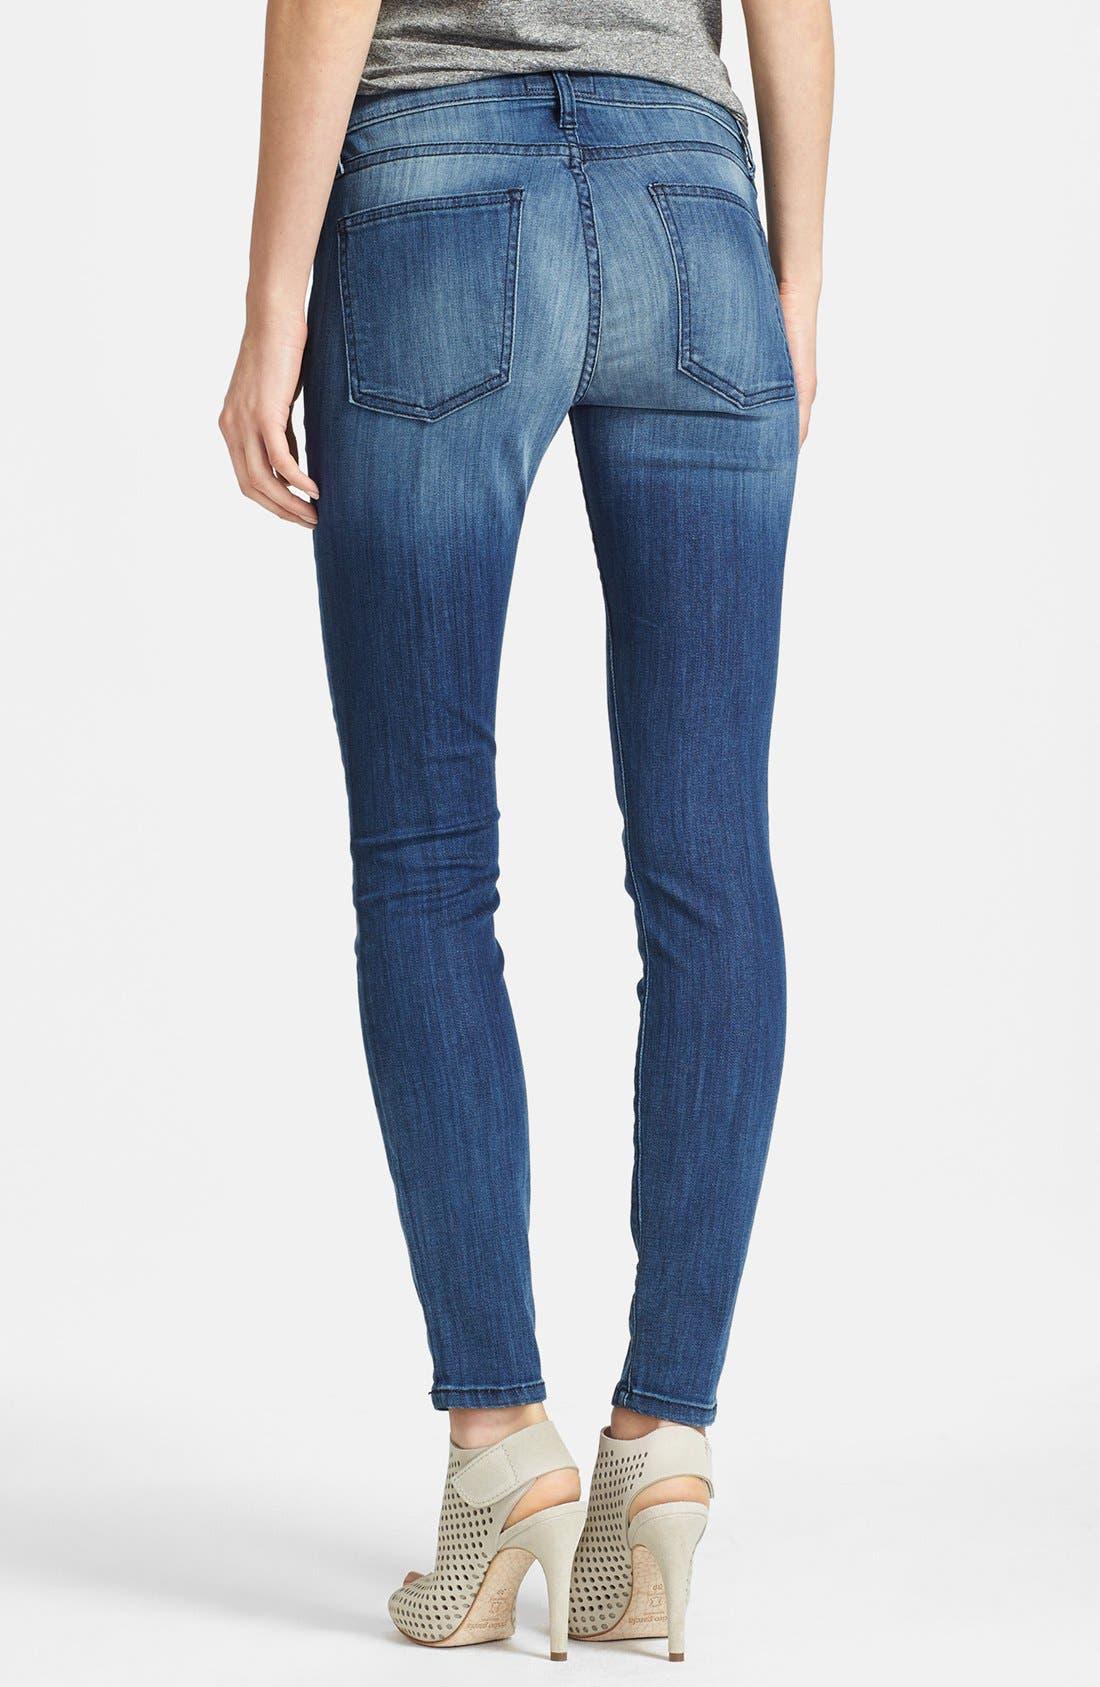 Alternate Image 2  - Current/Elliott 'The Stiletto' Skinny Jeans (Sunfade)